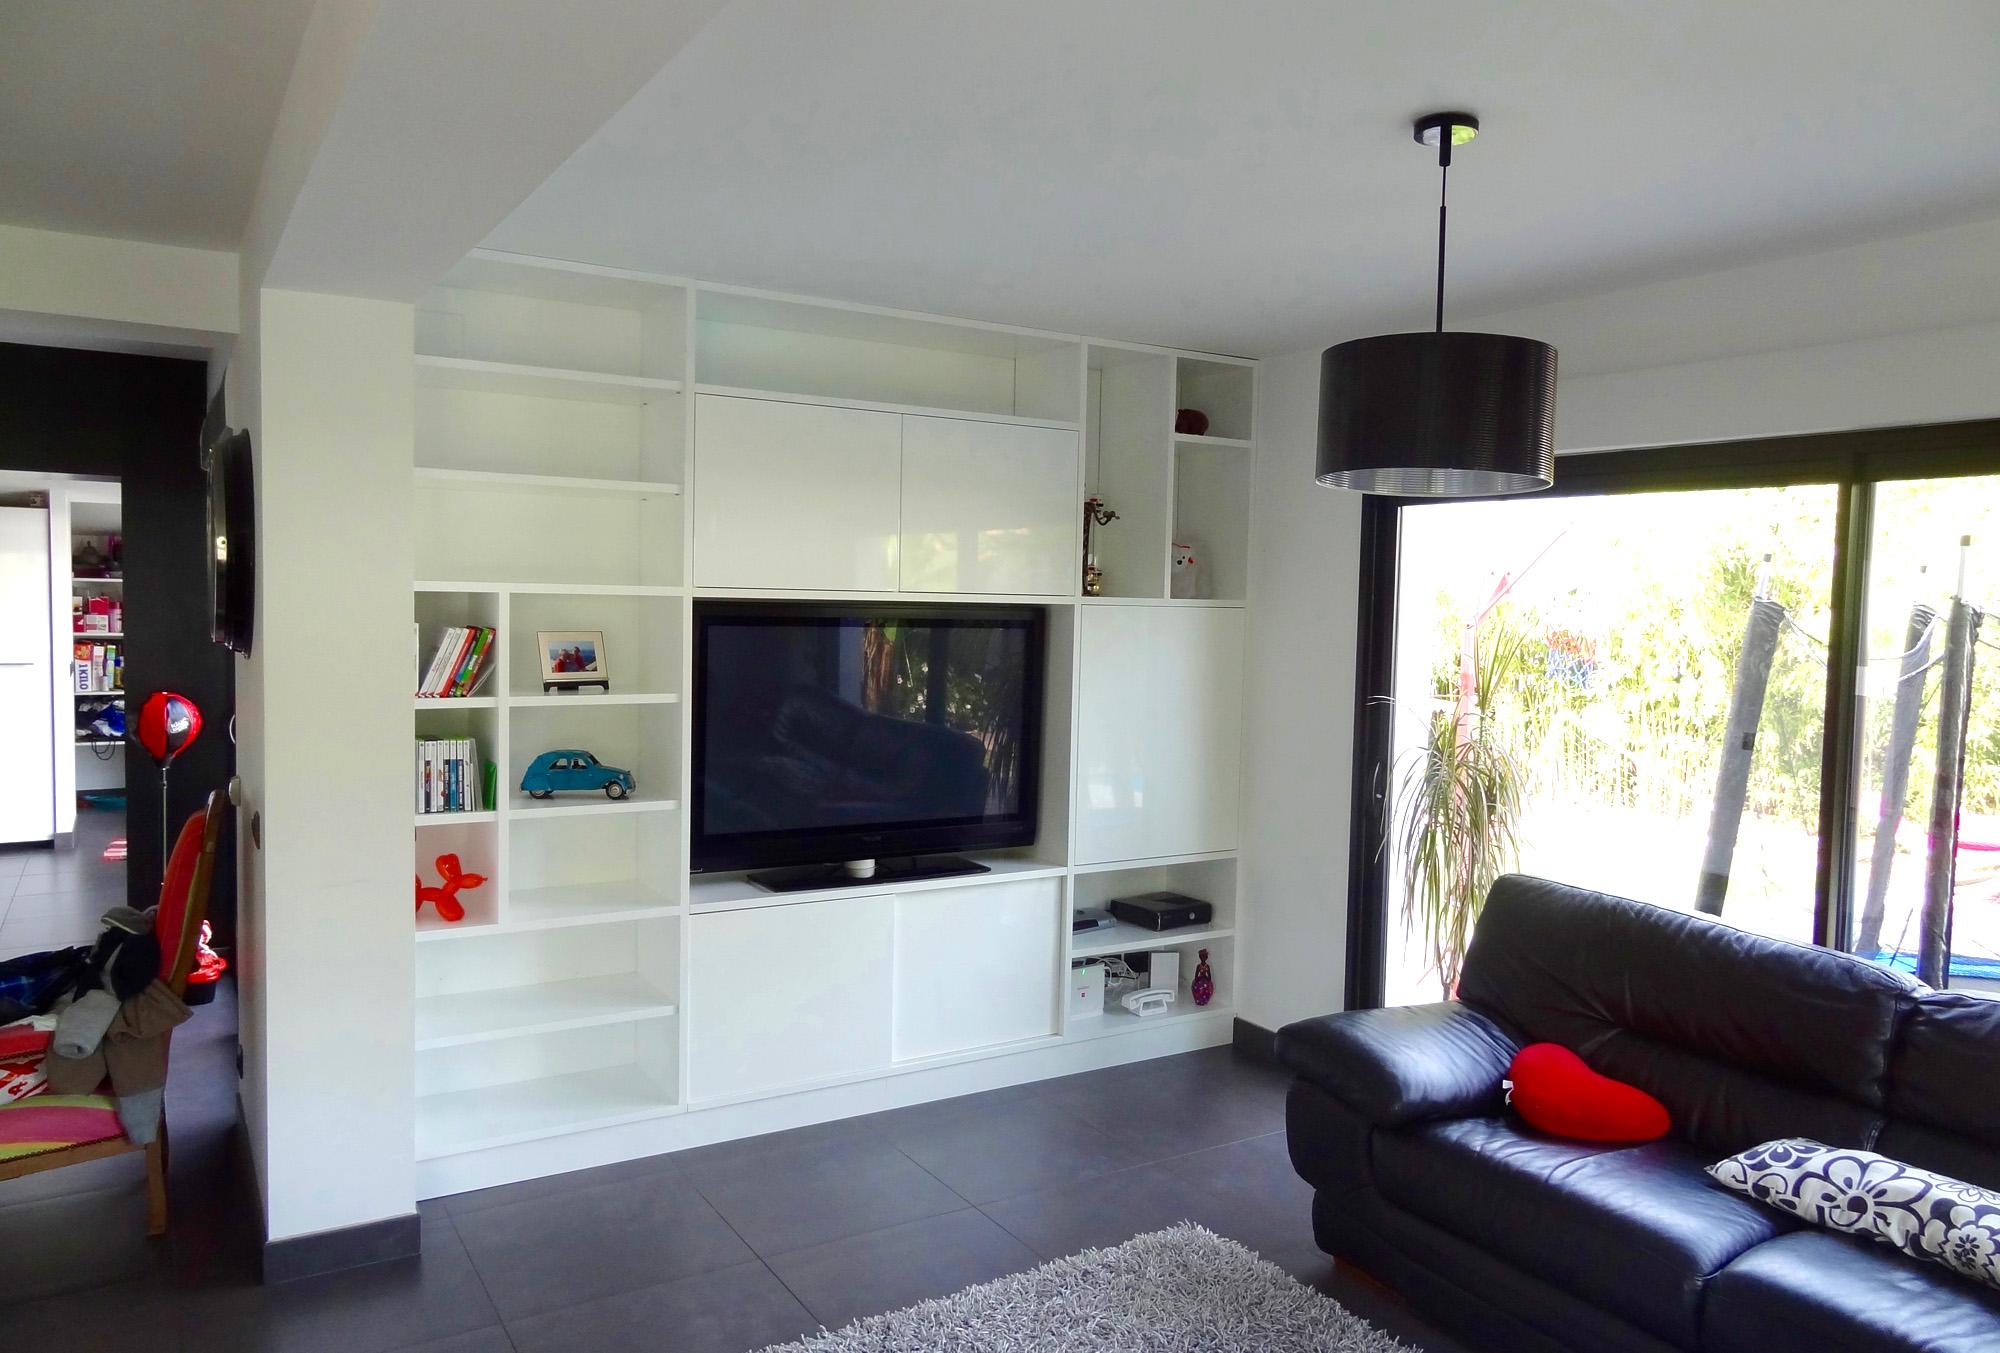 Meuble Tv Artola Menuiserie # Meuble Cloison Tv